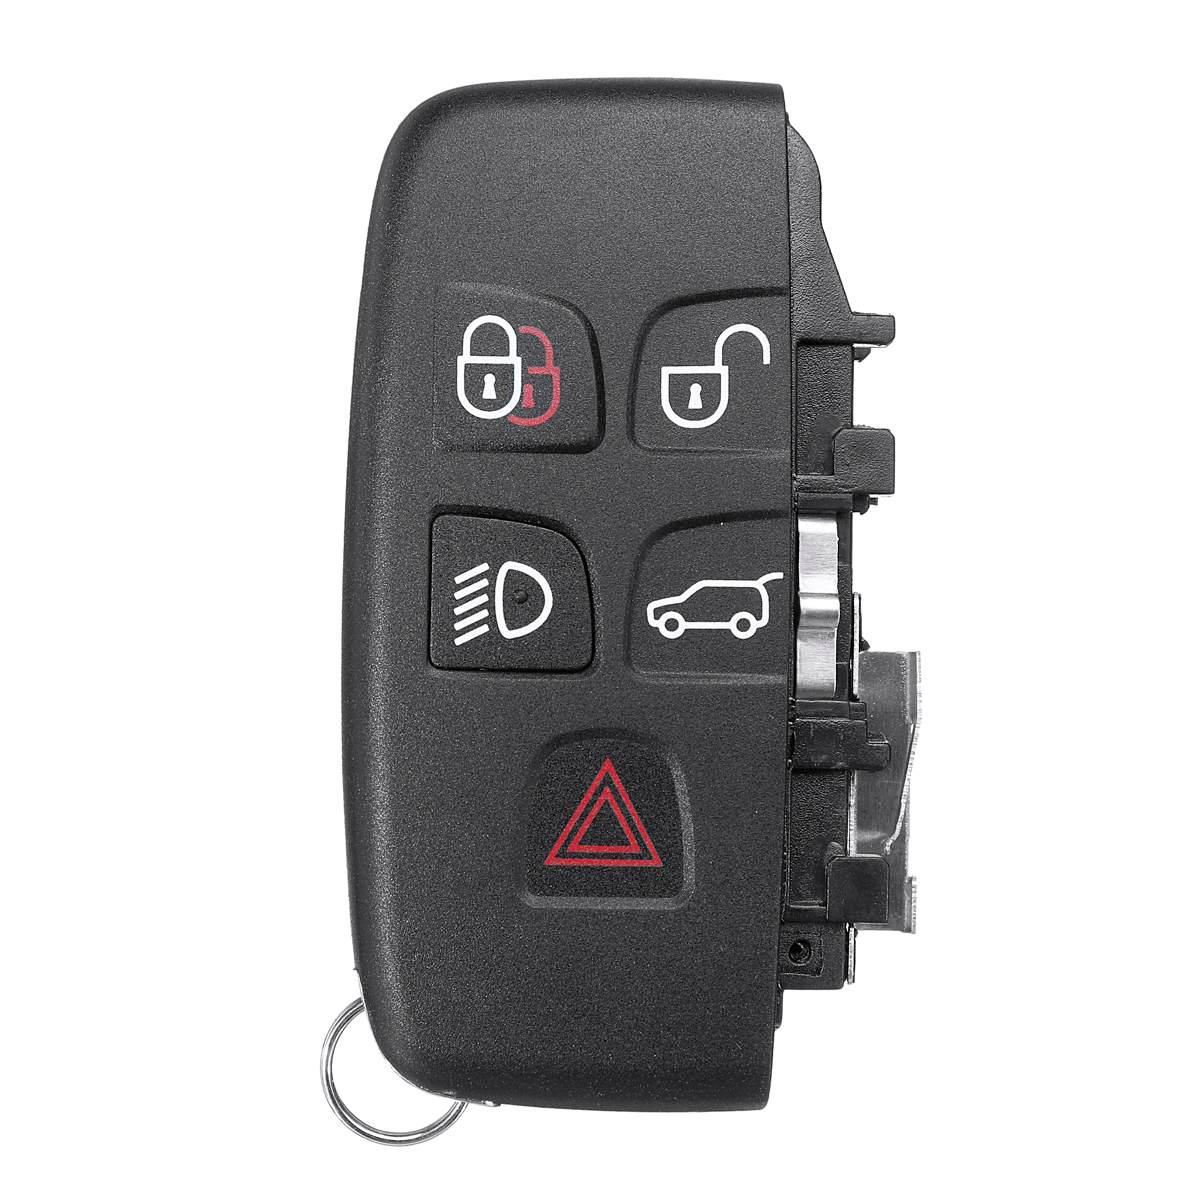 Land Rover LR2 LR4 Genuine Remote Control Key Fob Cover Case LR078922 New